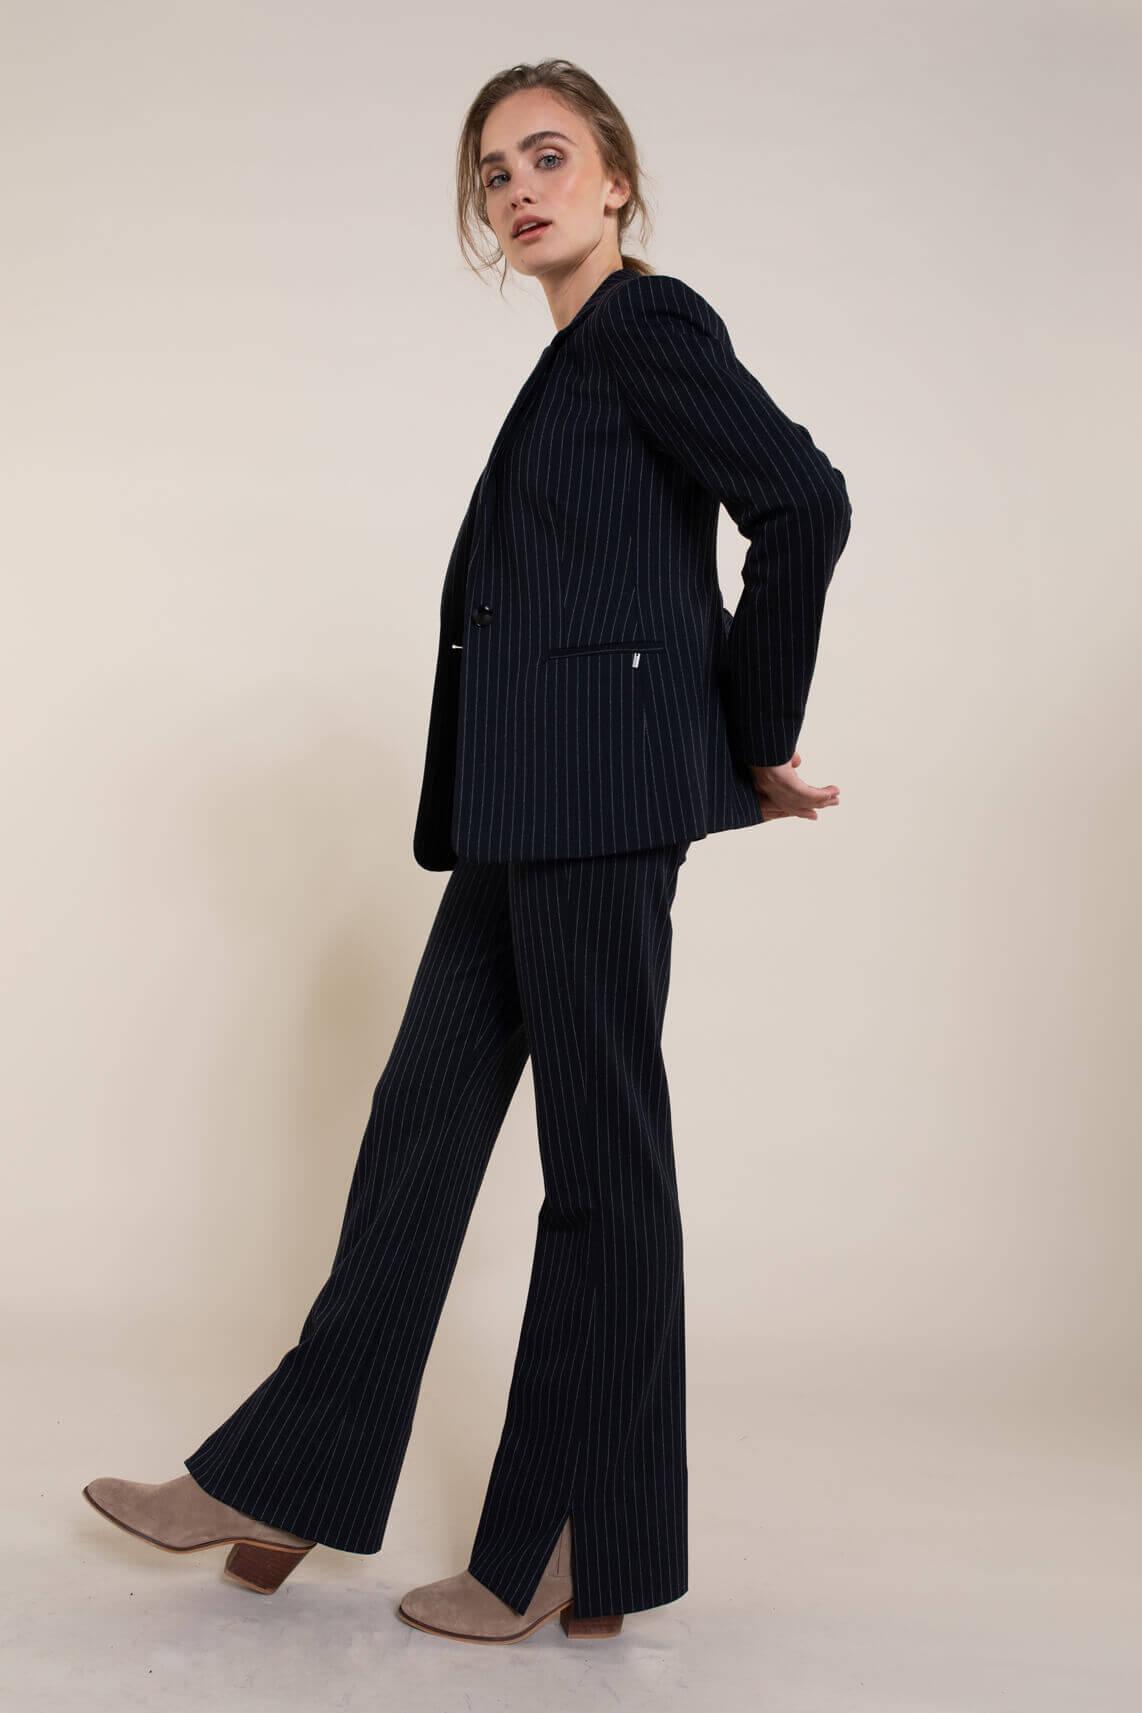 Anna Dames Pantalon met krijtstreep Blauw